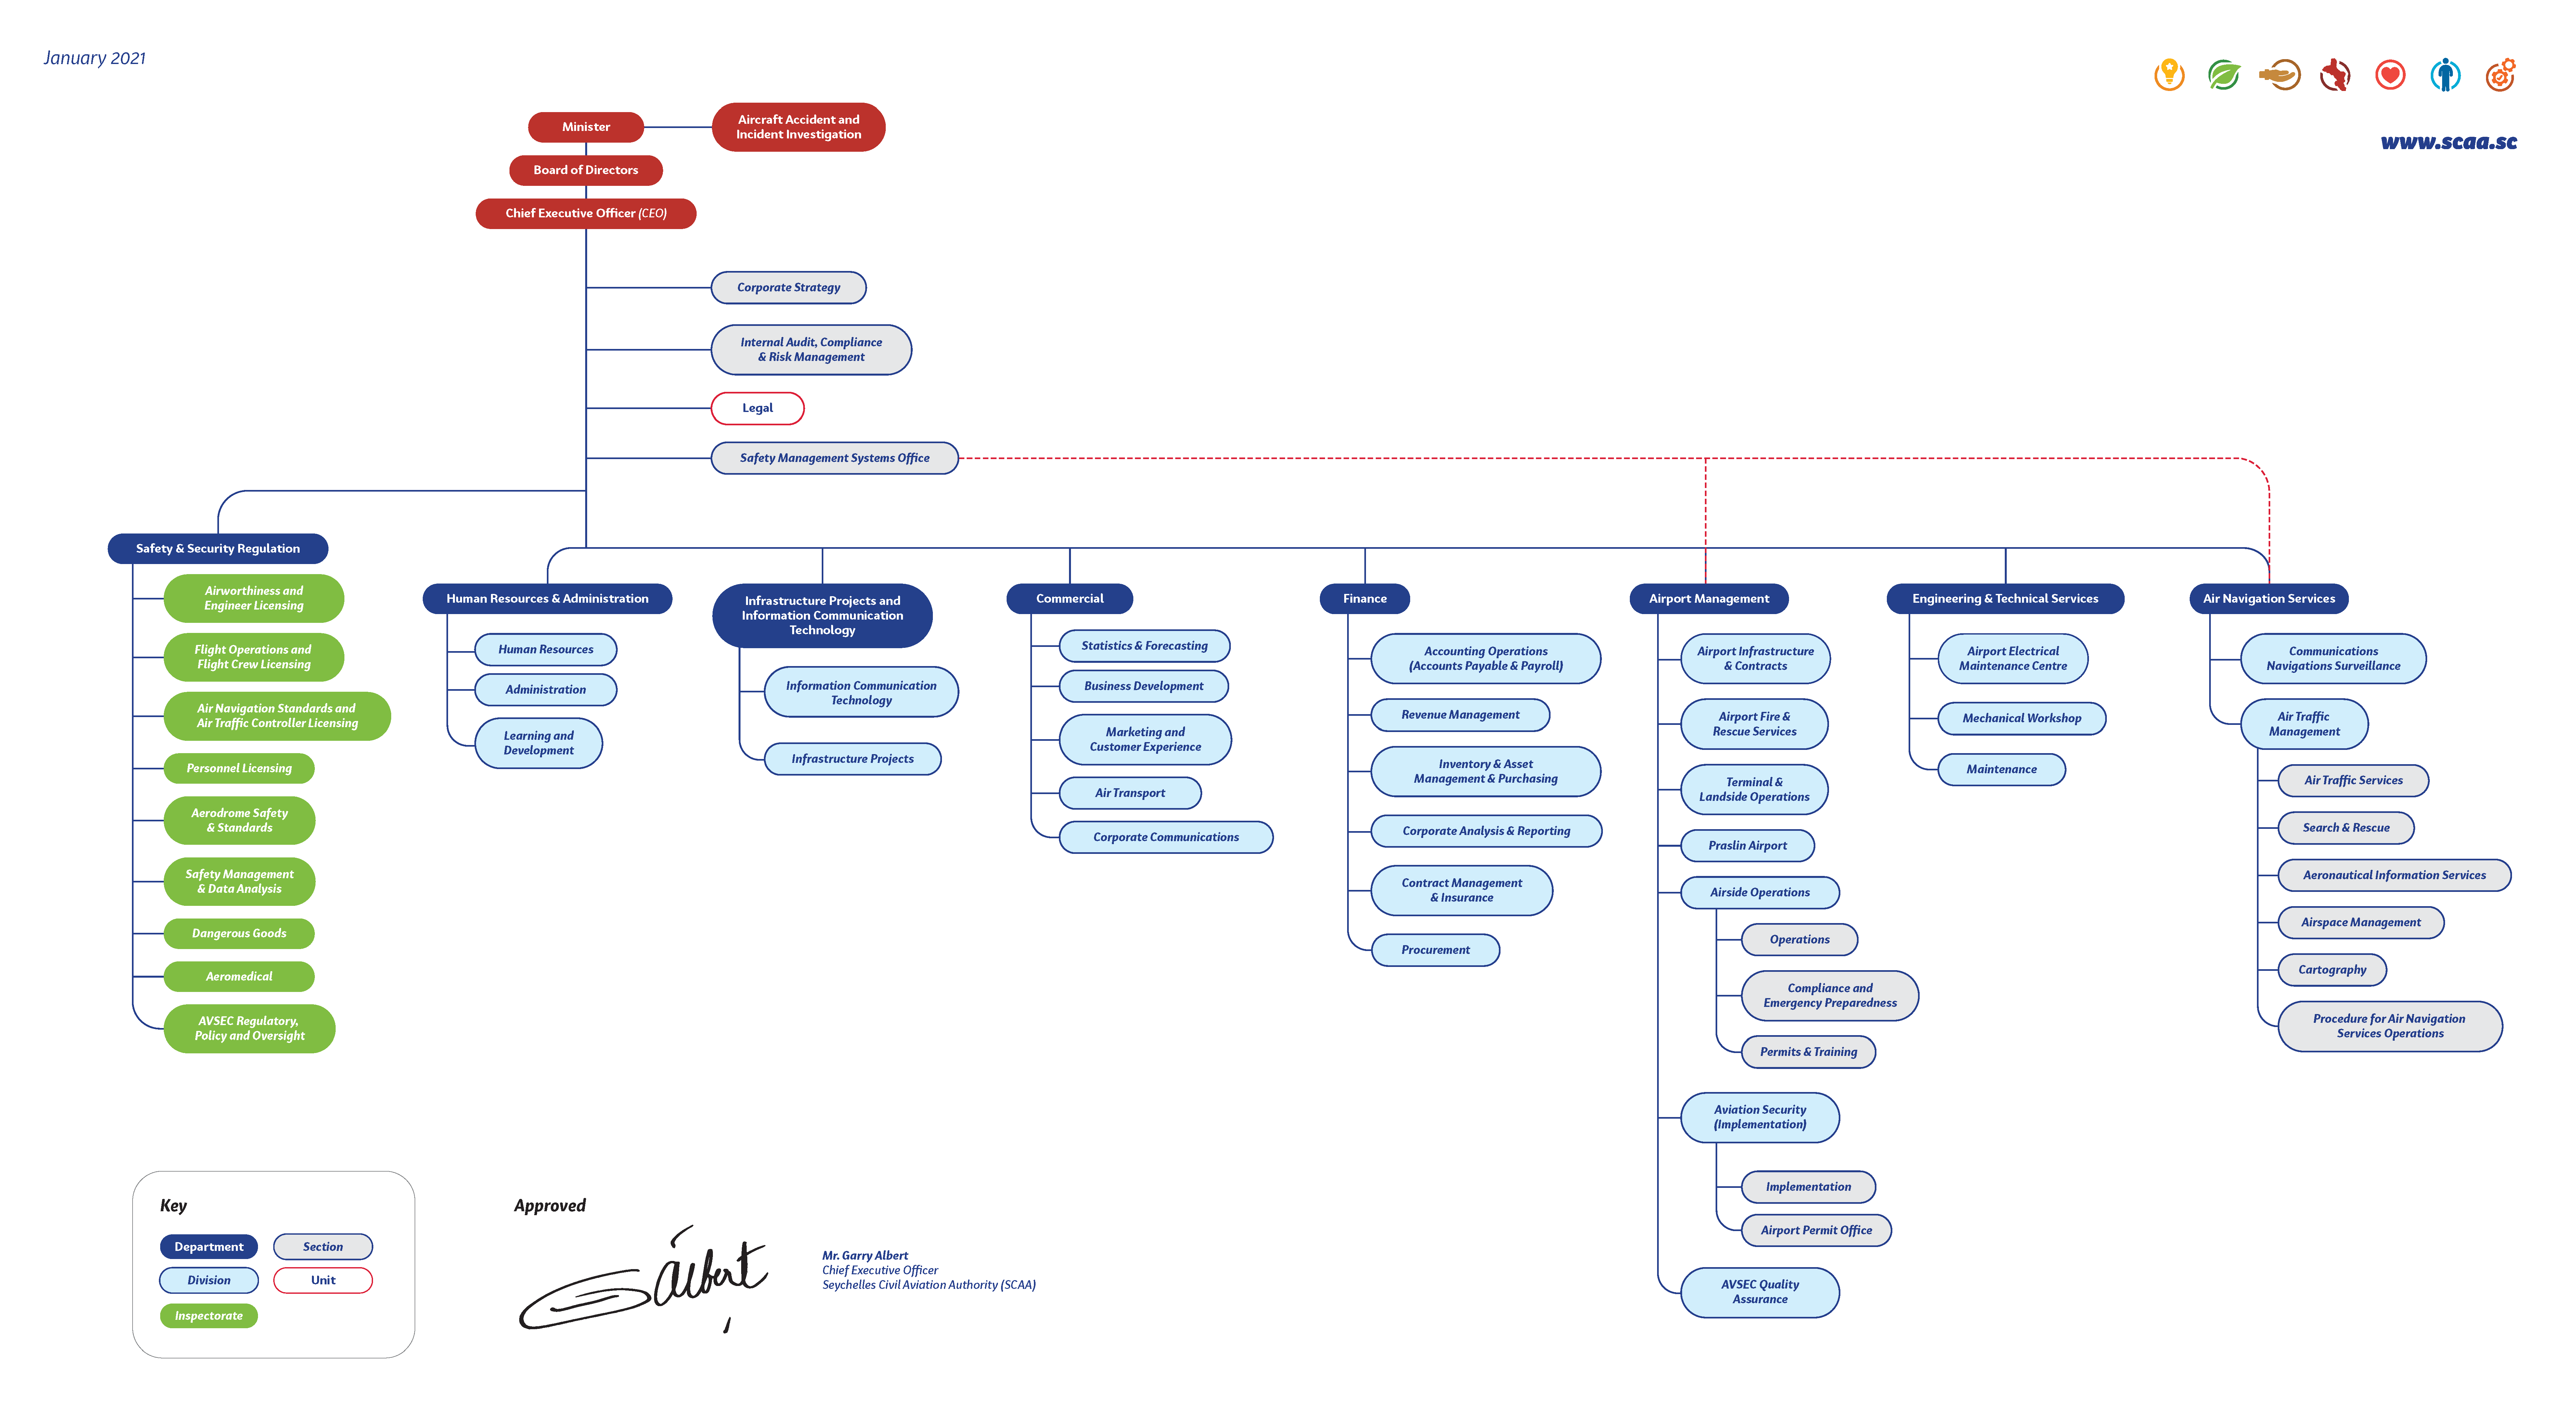 SCAA_Organization_Chart_2021.png